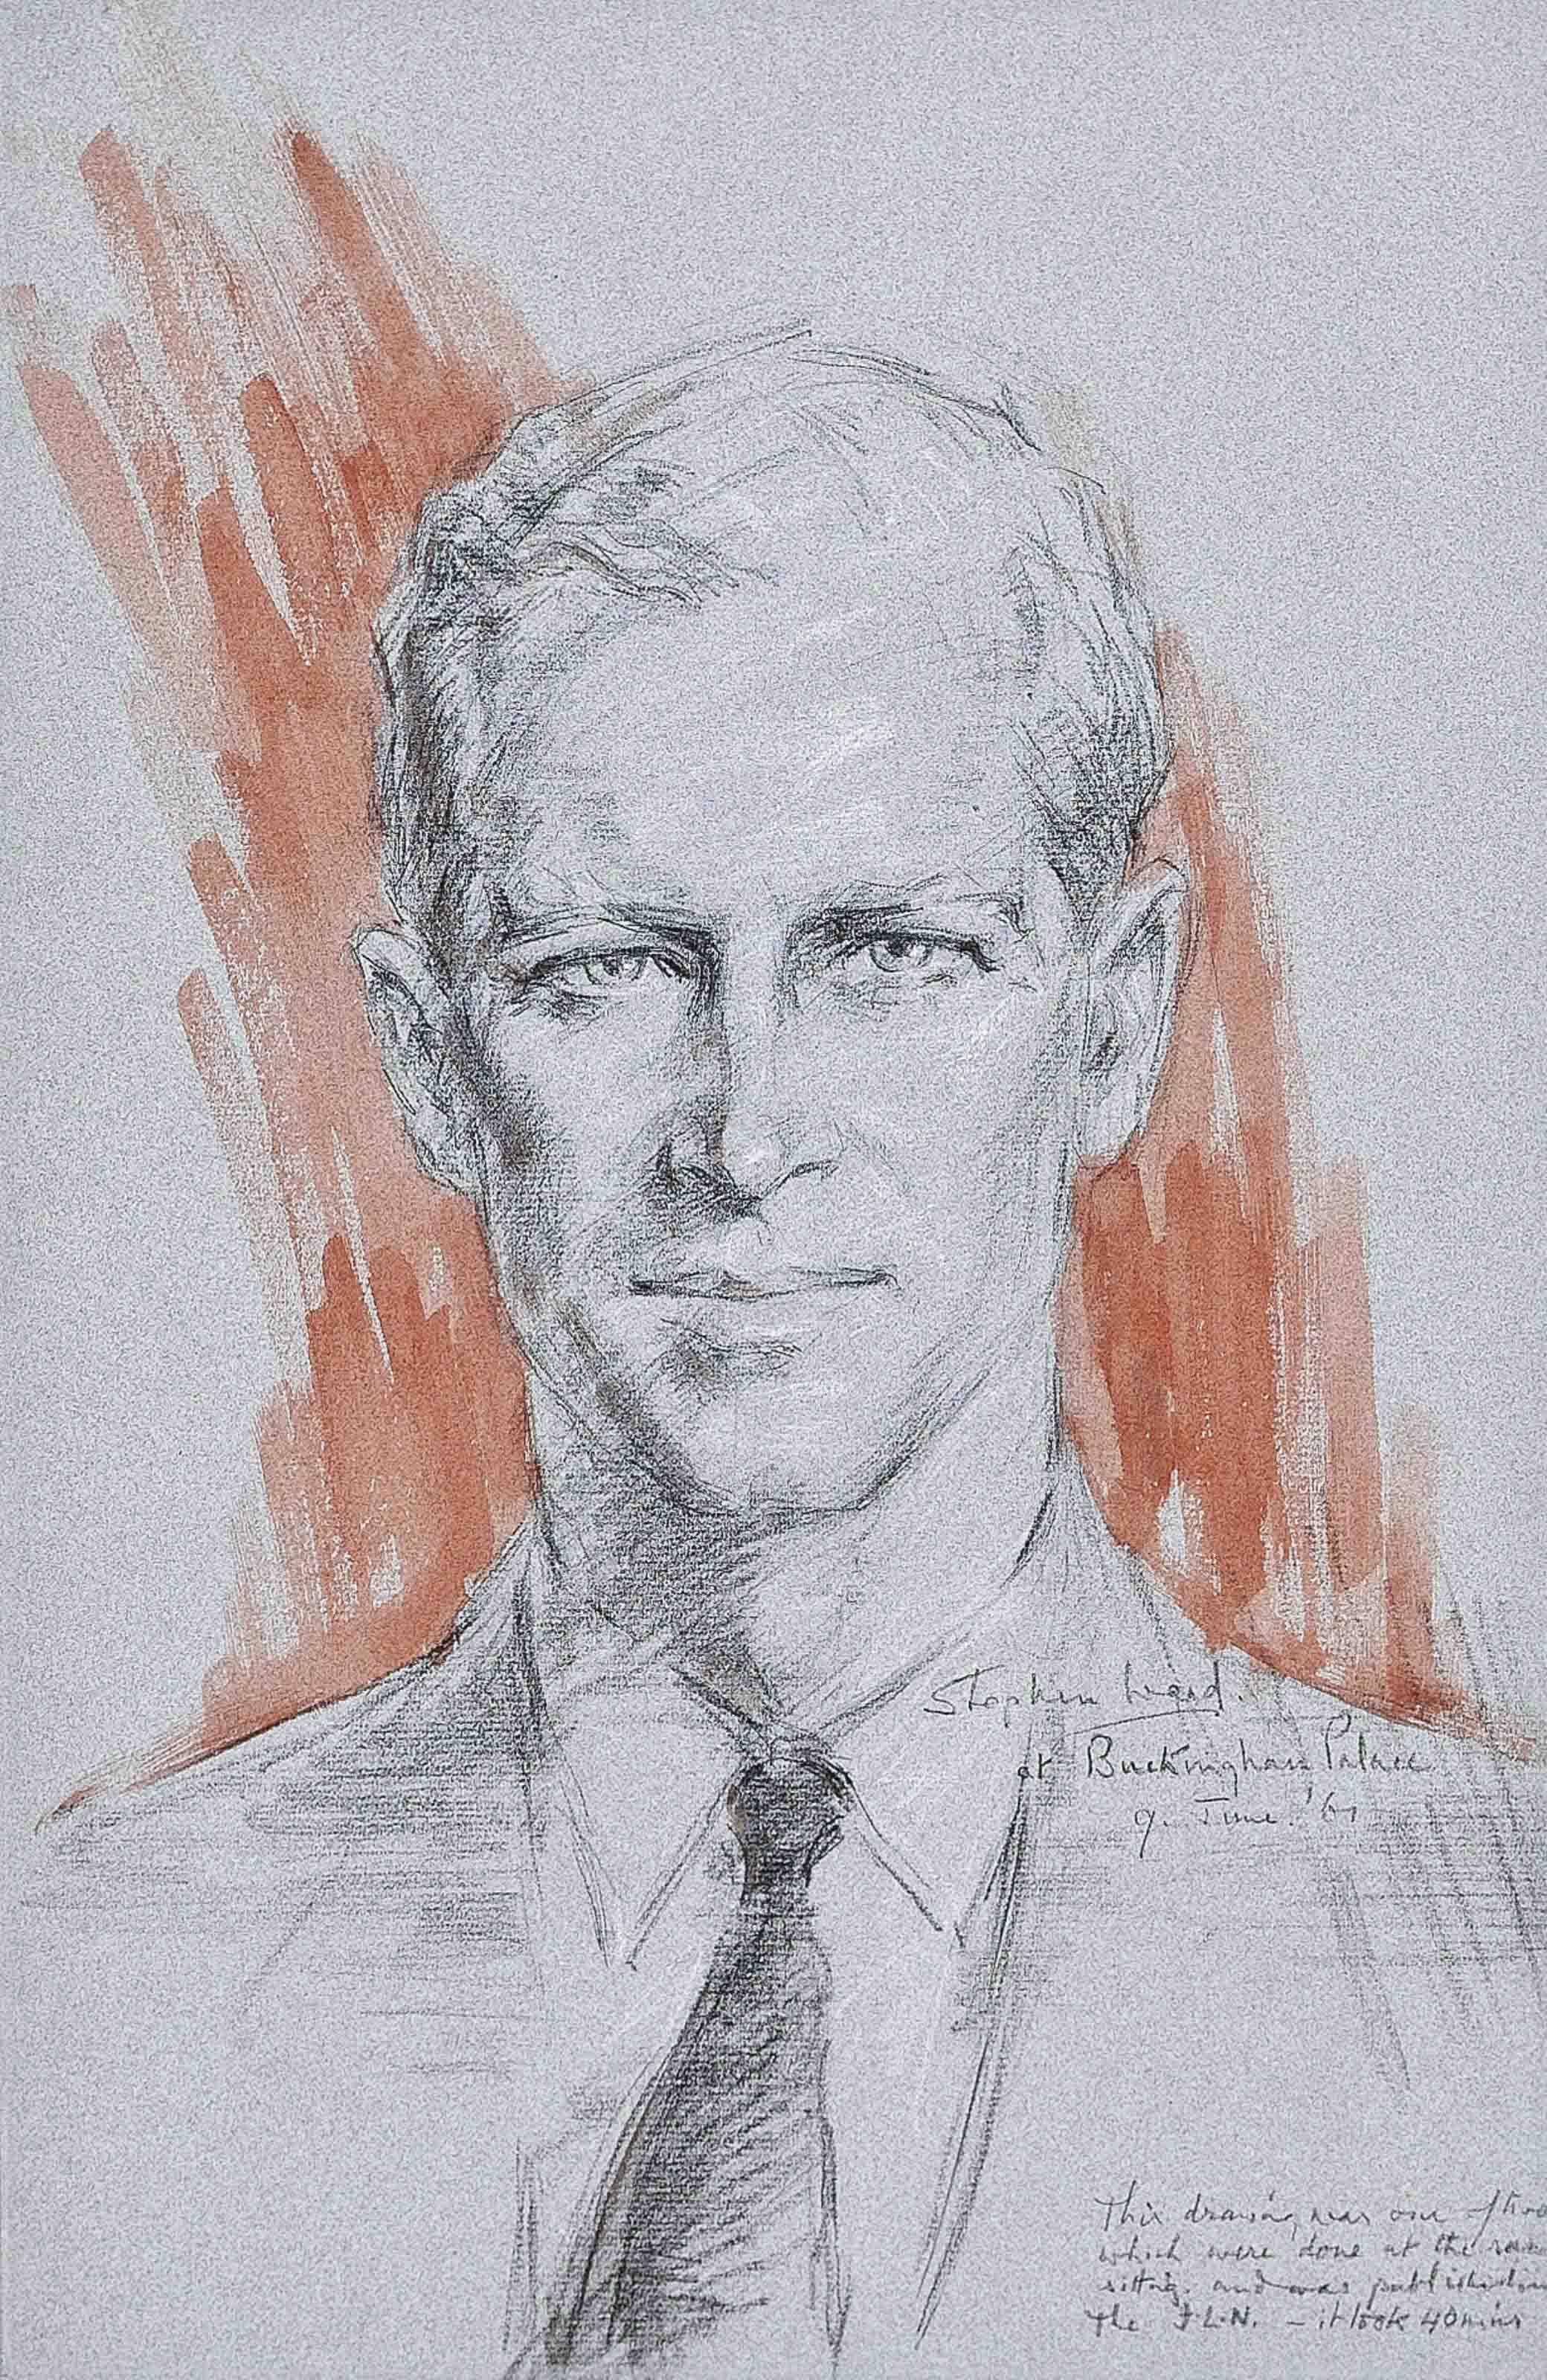 Portrait of His Royal Highness The Prince Philip, Duke of Edinburgh